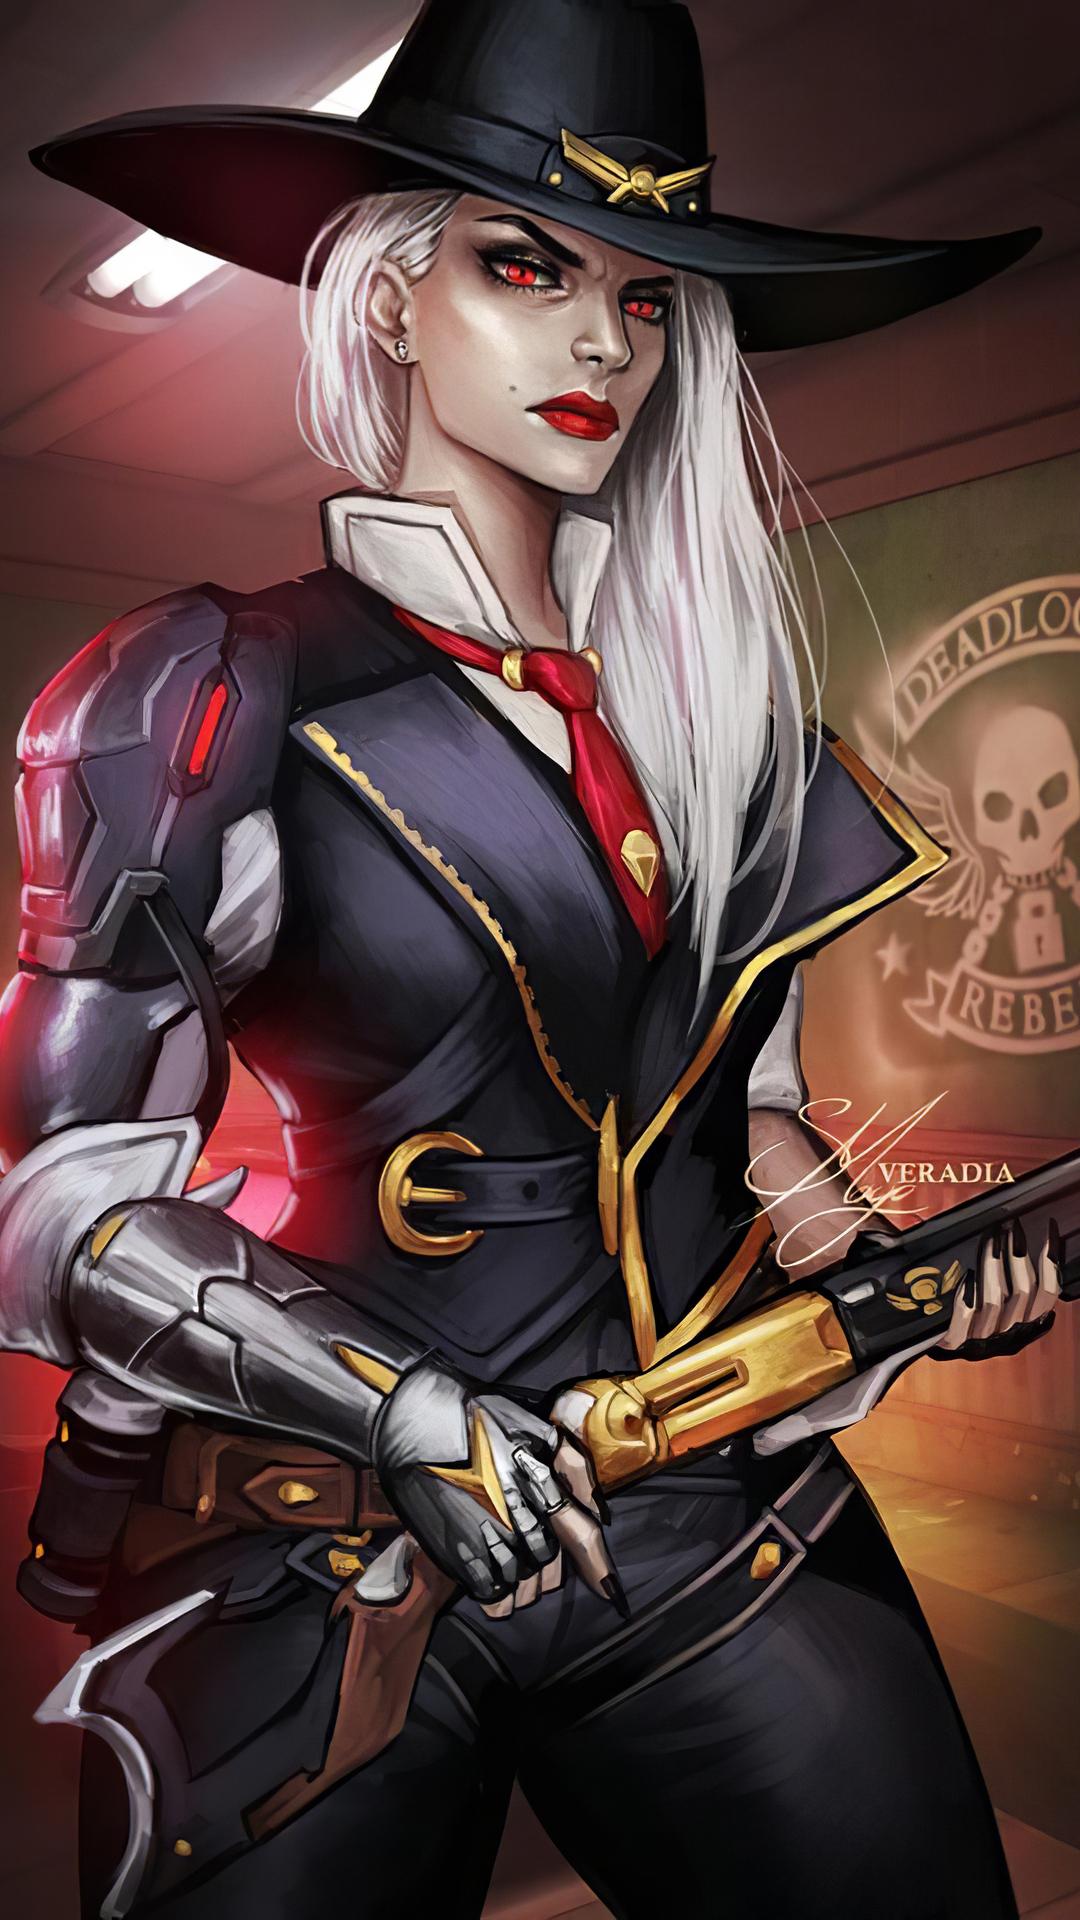 ashe-overwatch-character-6l.jpg